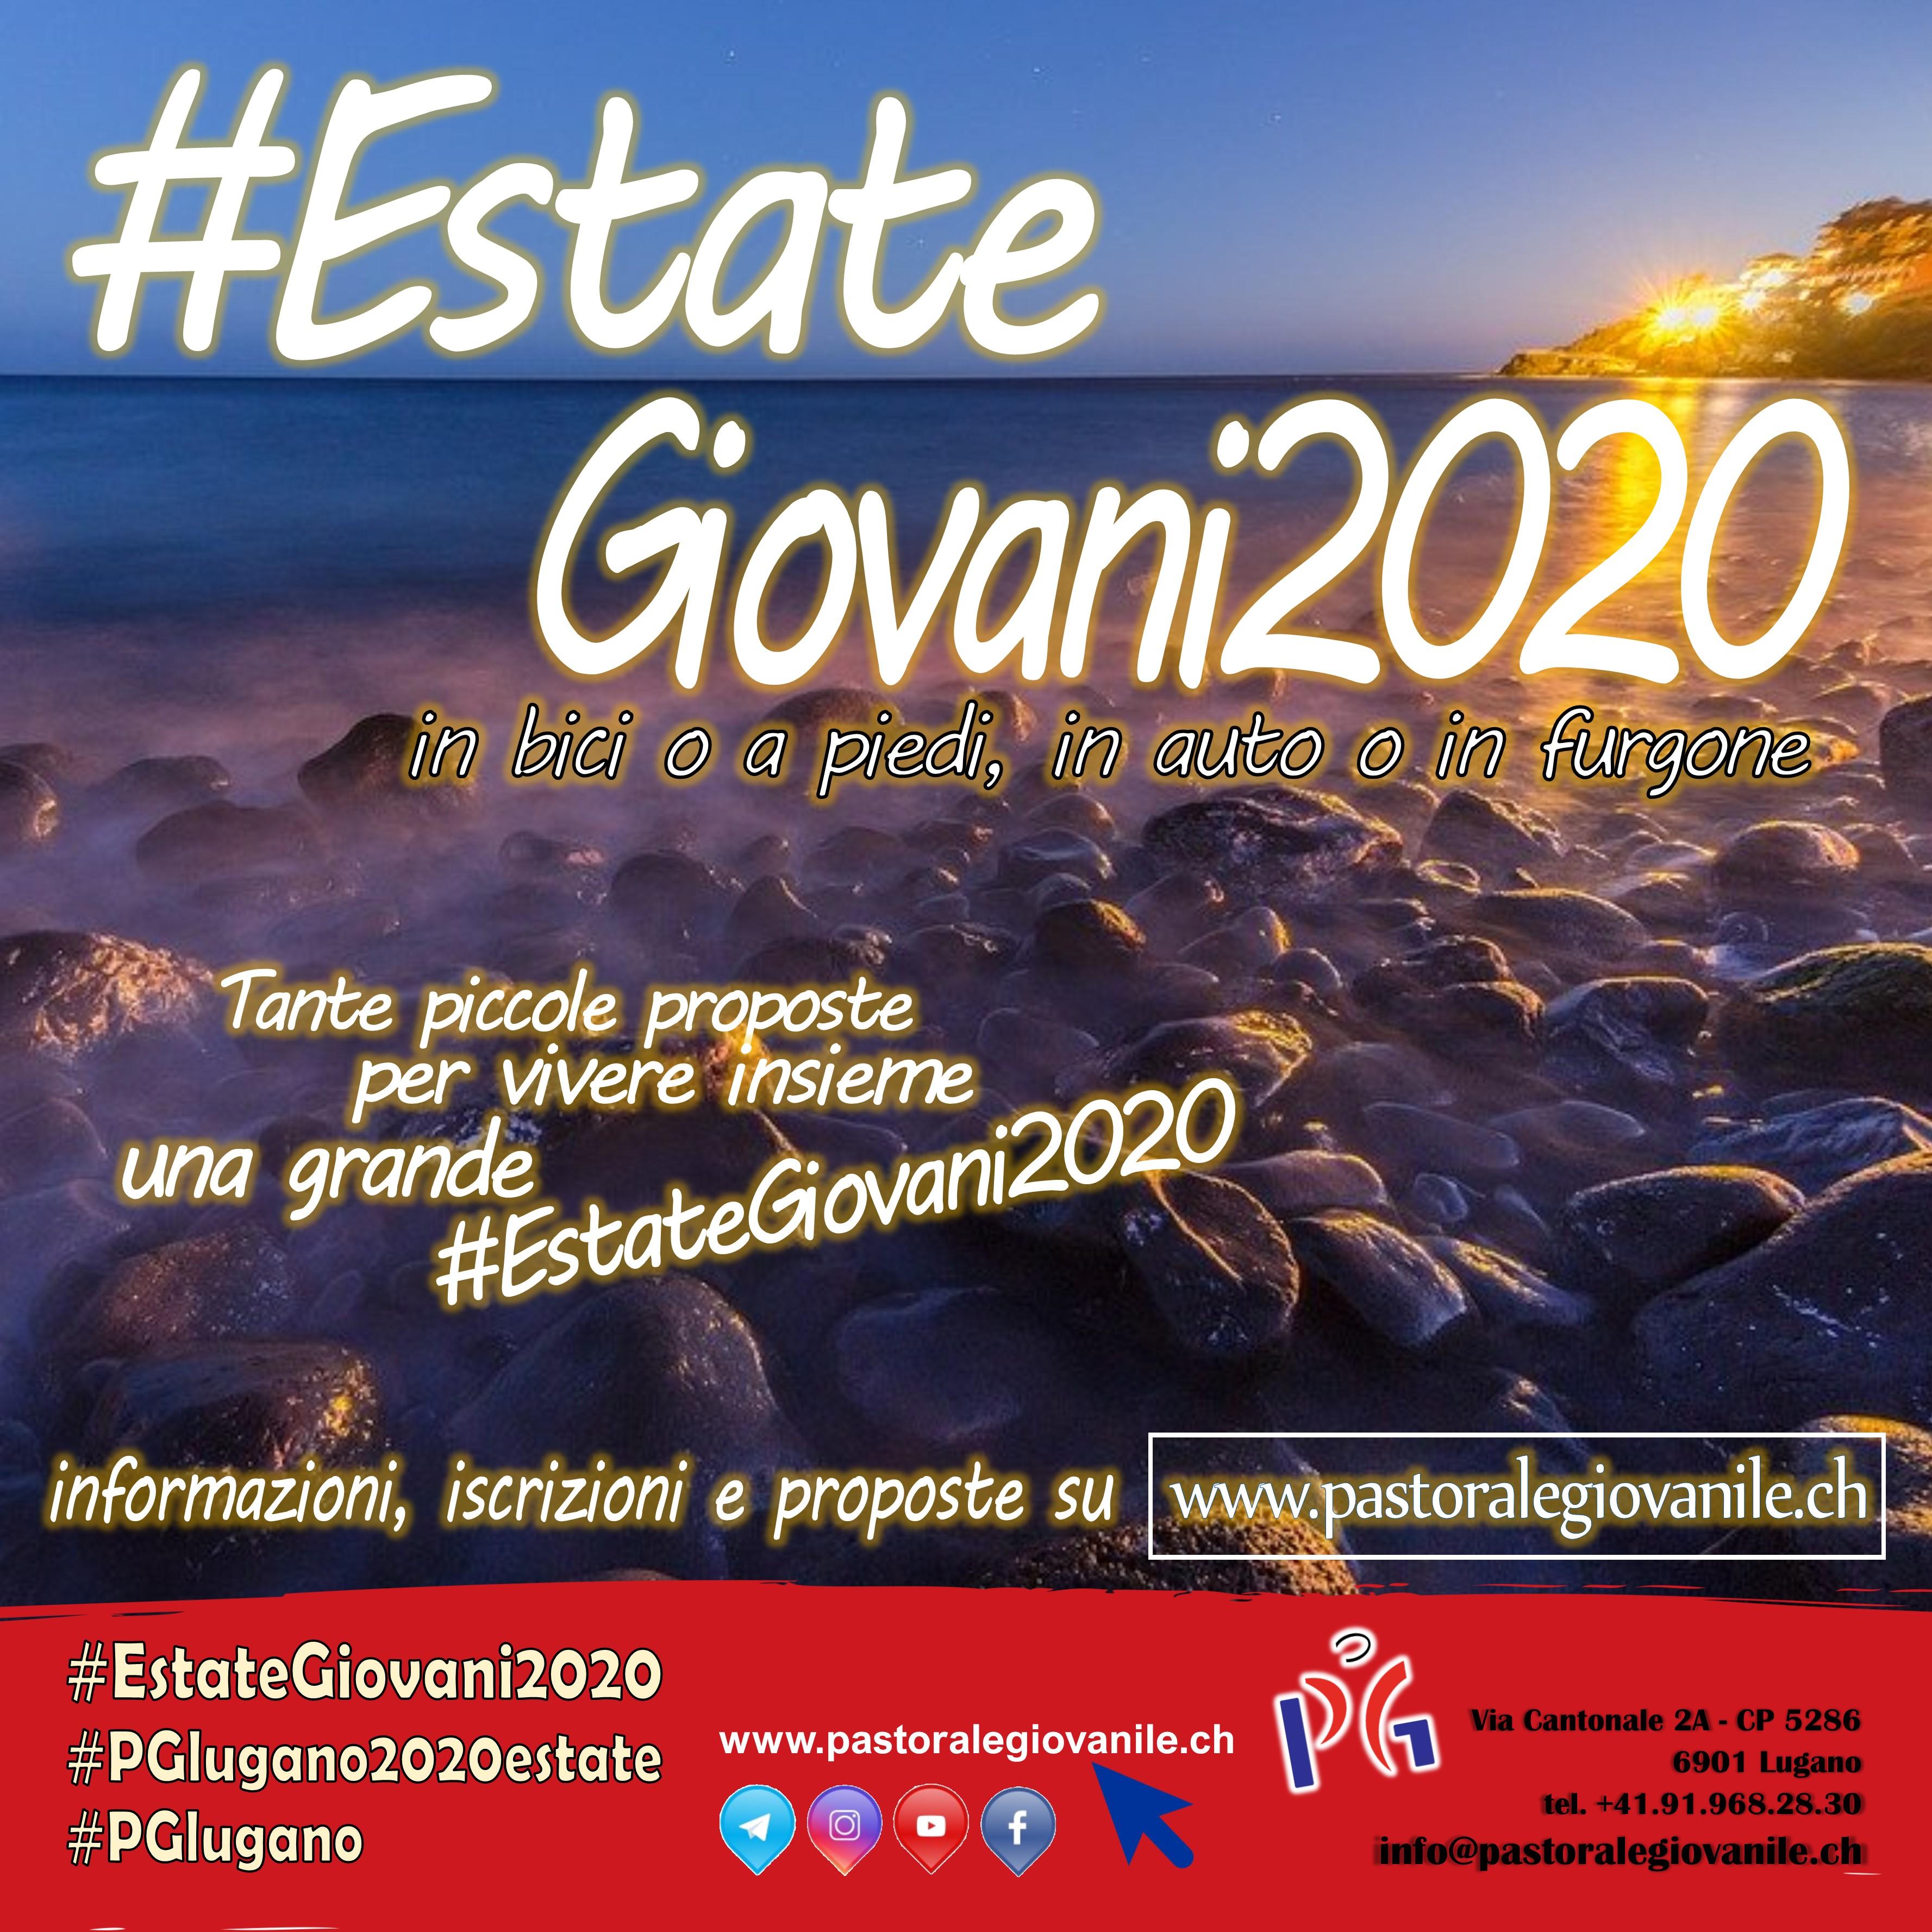 proposte 2020 - generico